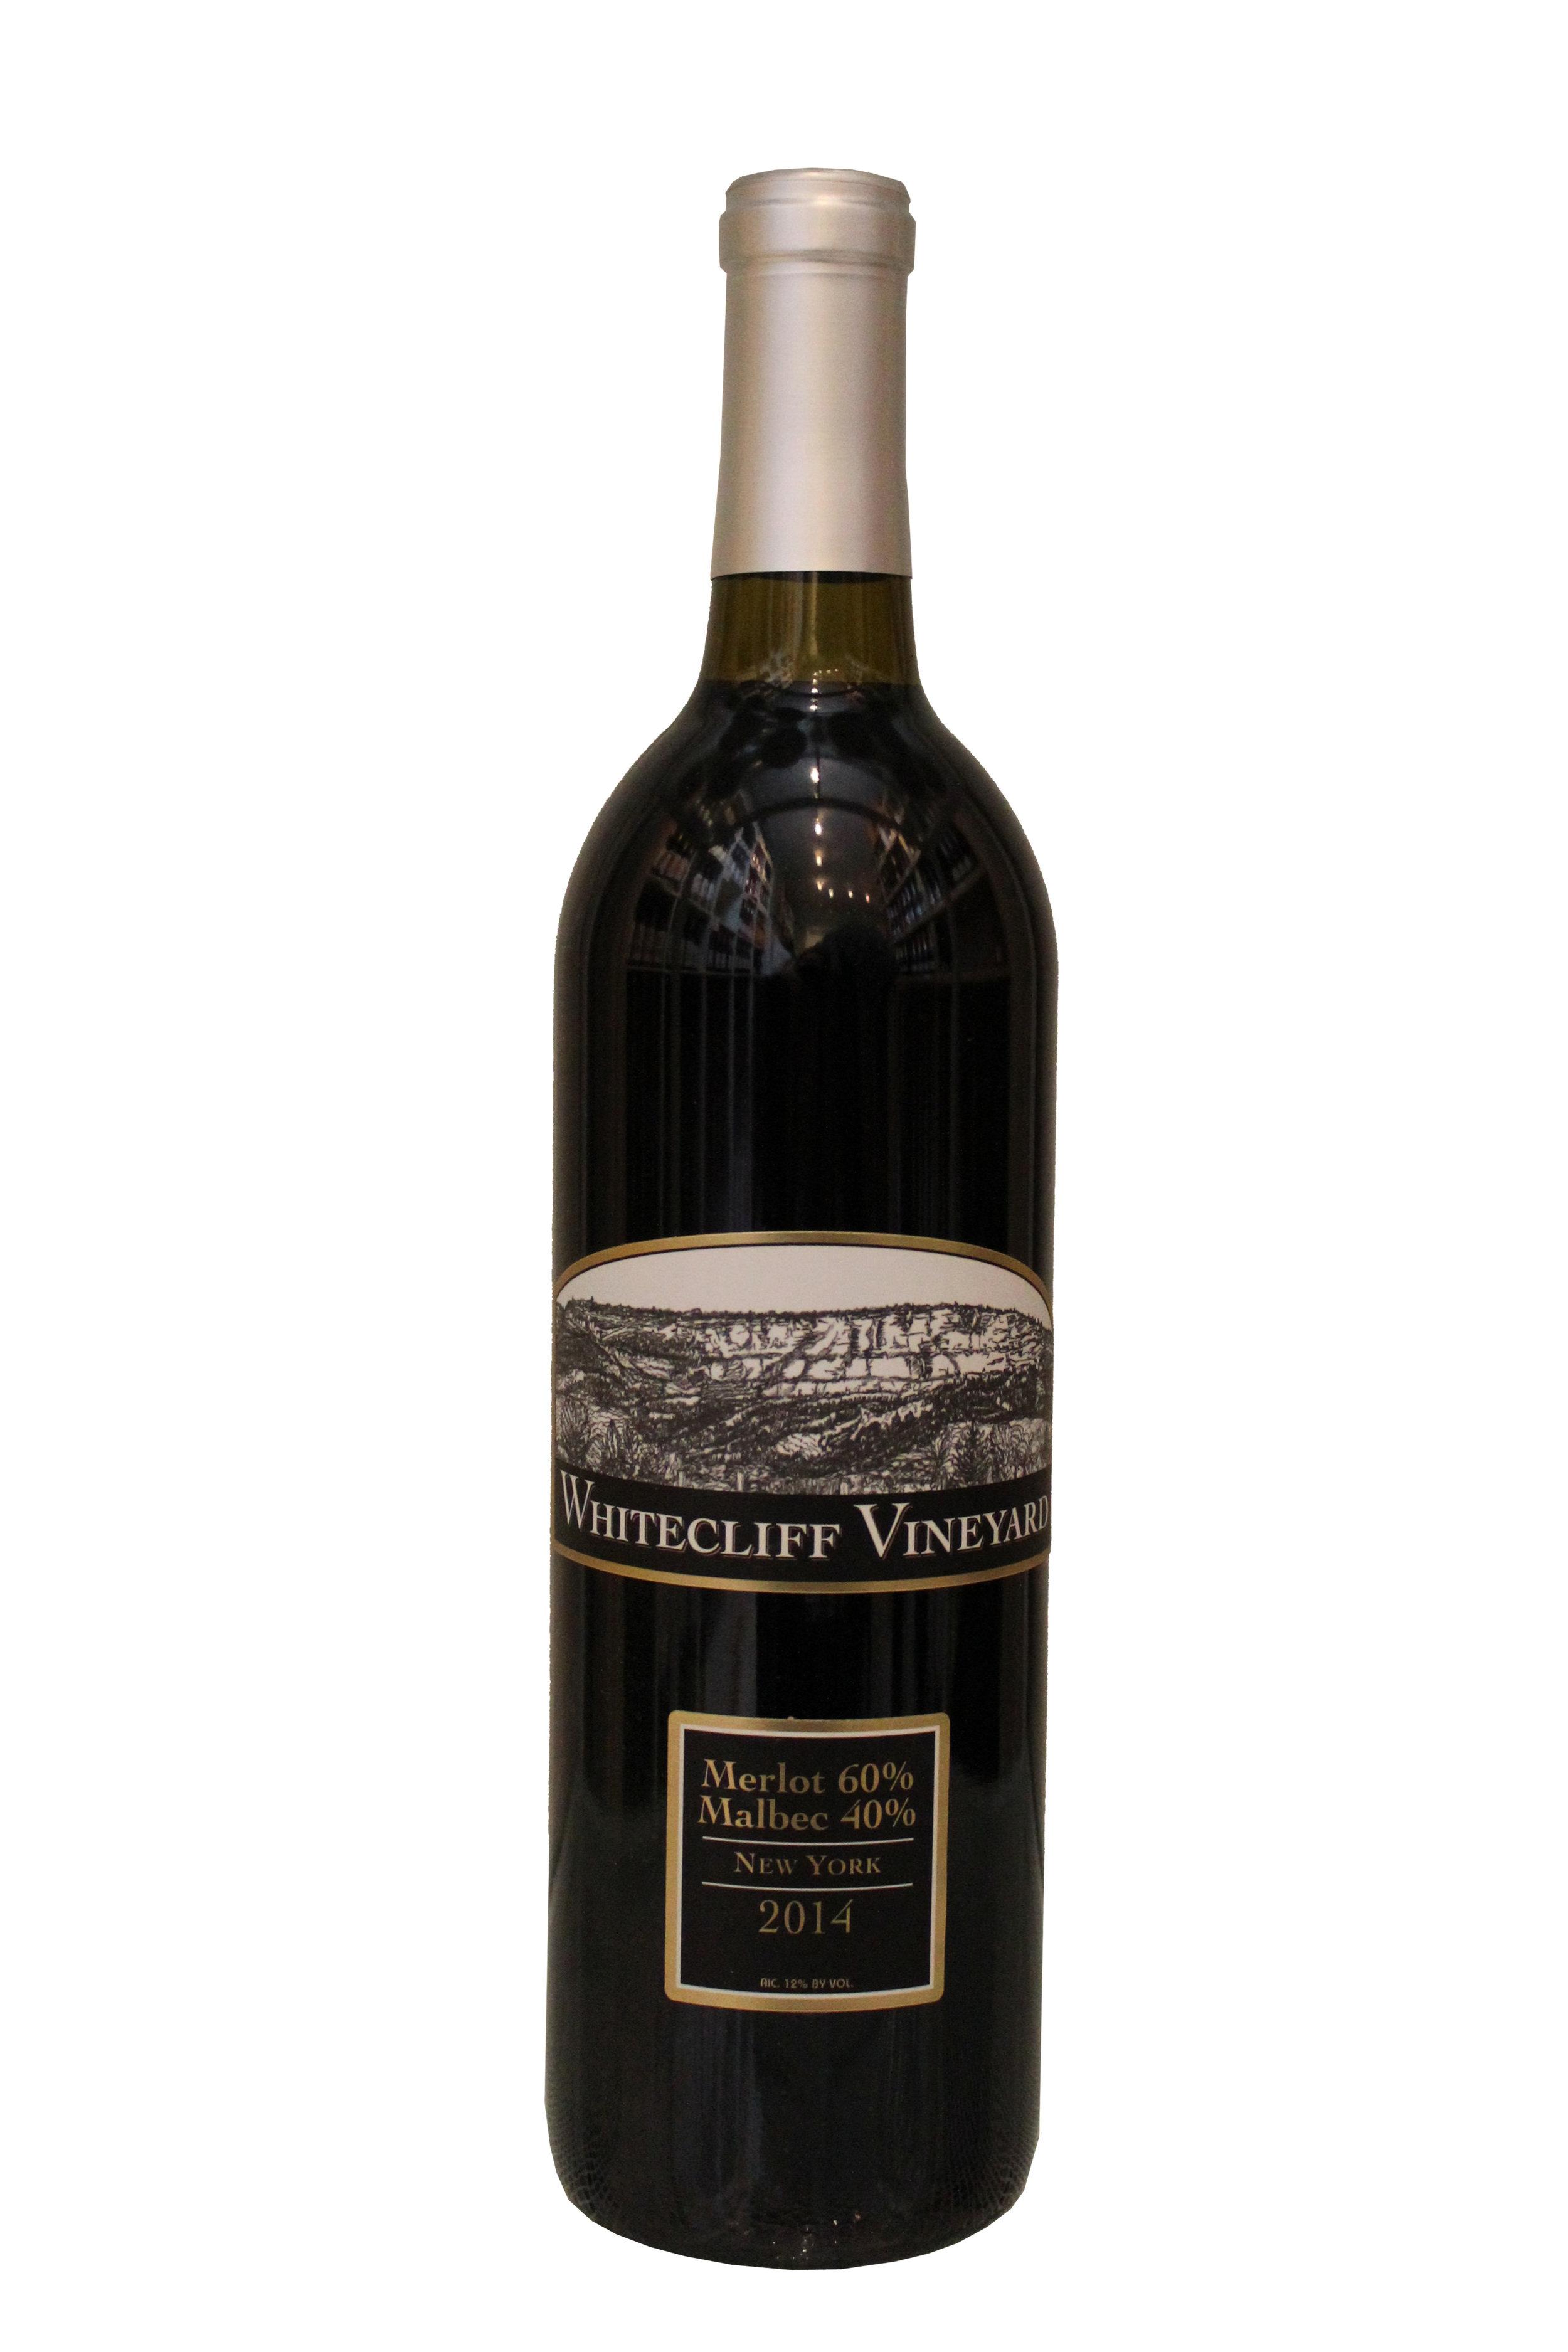 Merlot-Malbec Blend  Whitecliff Vineyard, New York